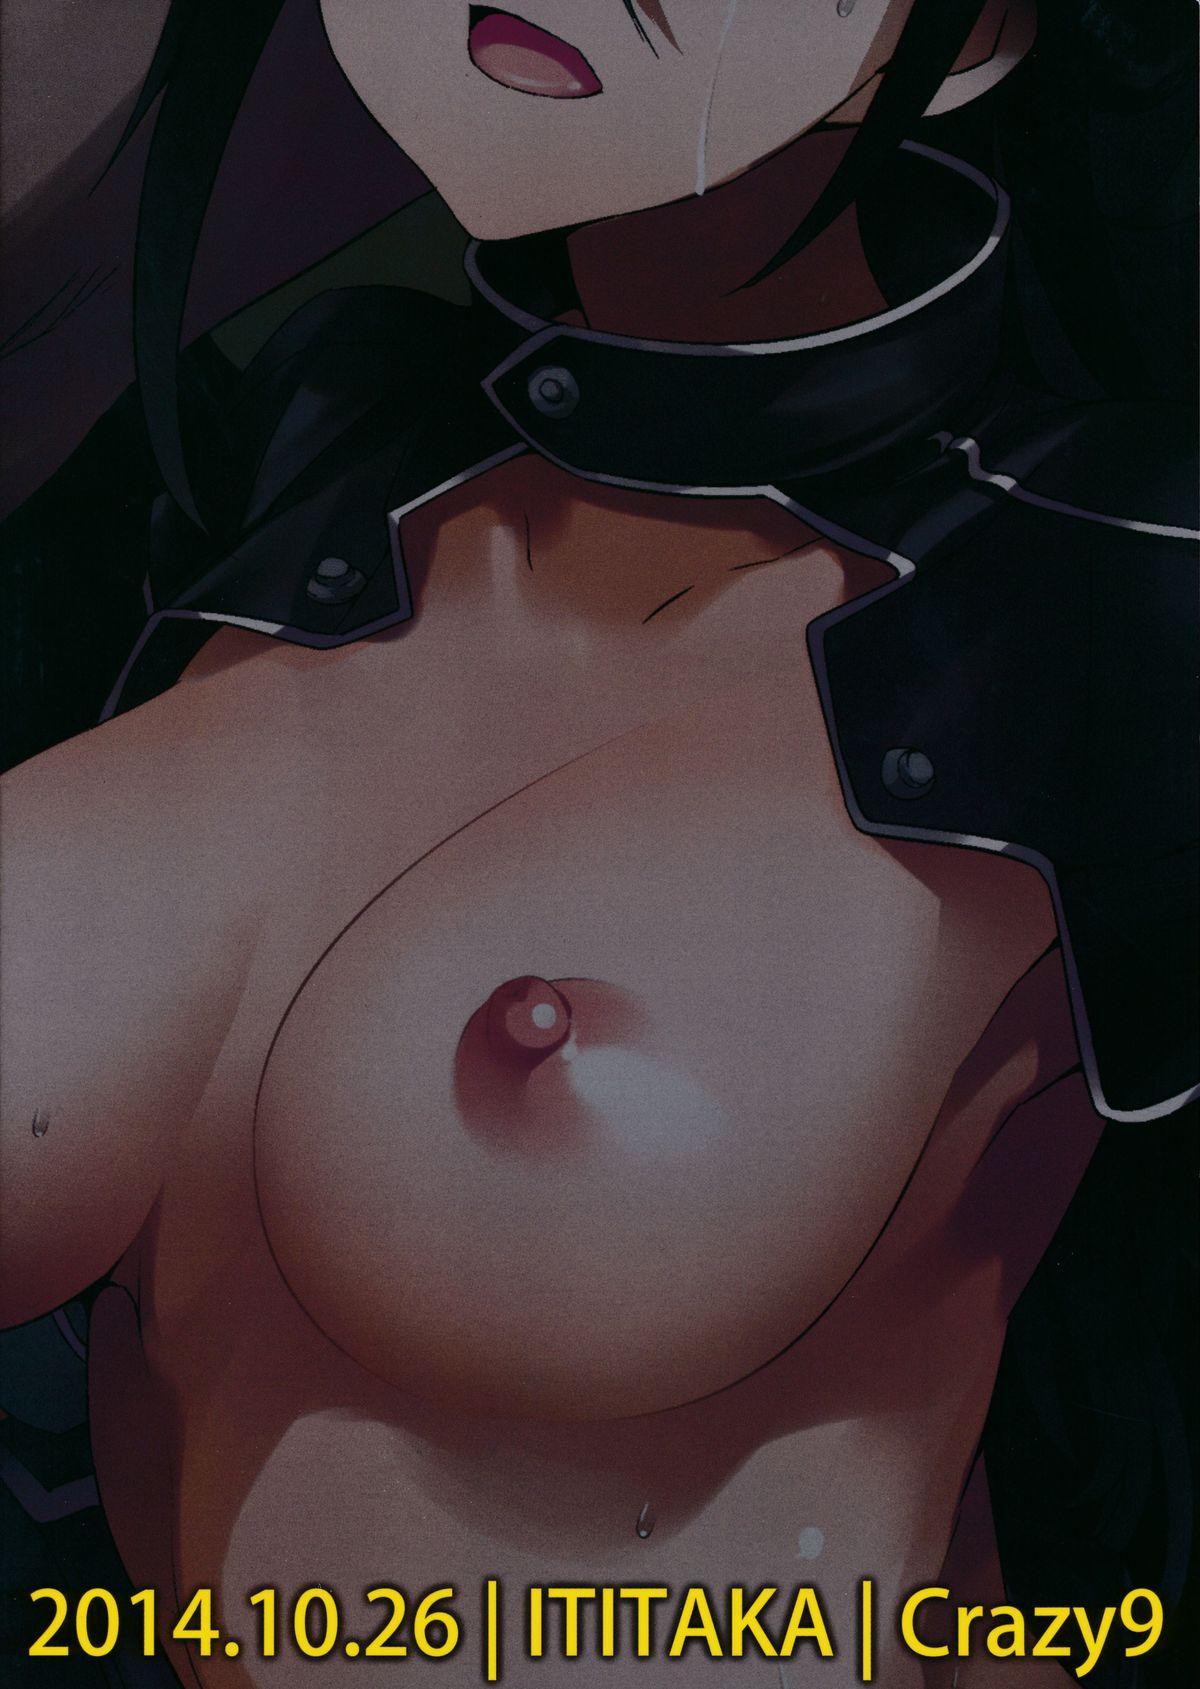 (SC65) [Crazy9 (Ichitaka)] C9-14 TS~Kirito-chan no Avatar wa Random Nyotai (Sword Art Online) [English] {CGrascal} 1